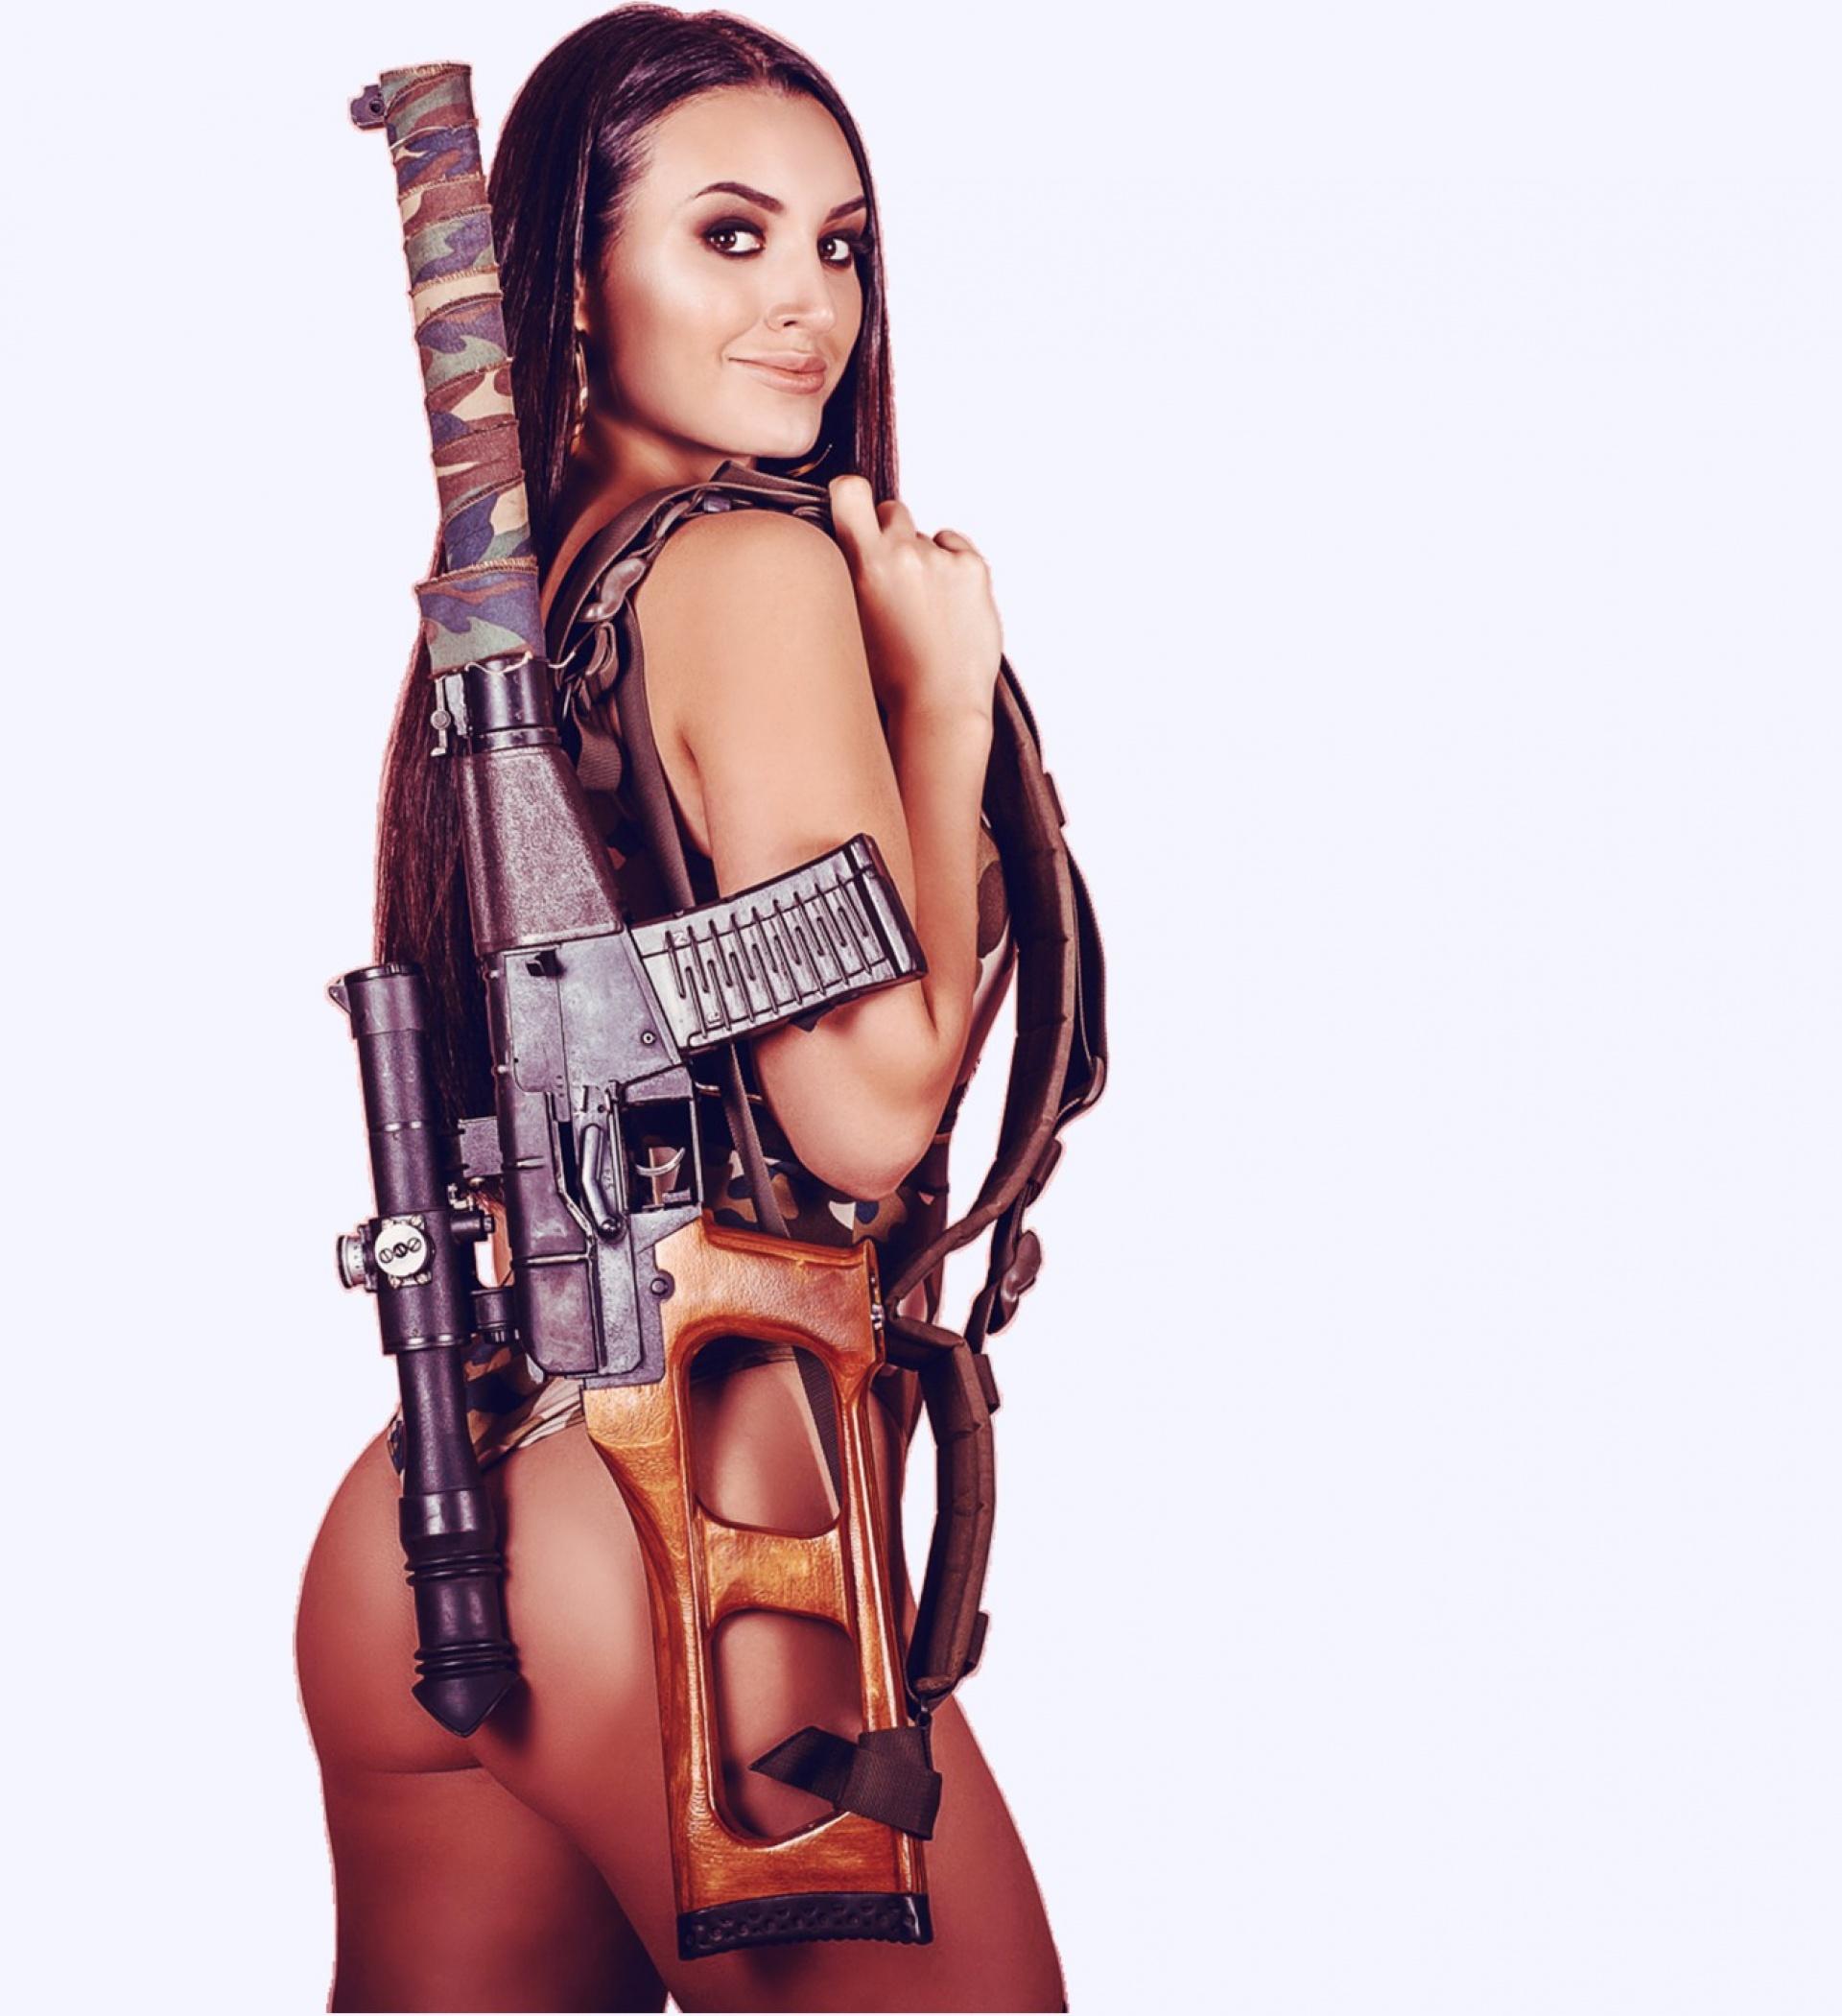 sexy girl with big gun